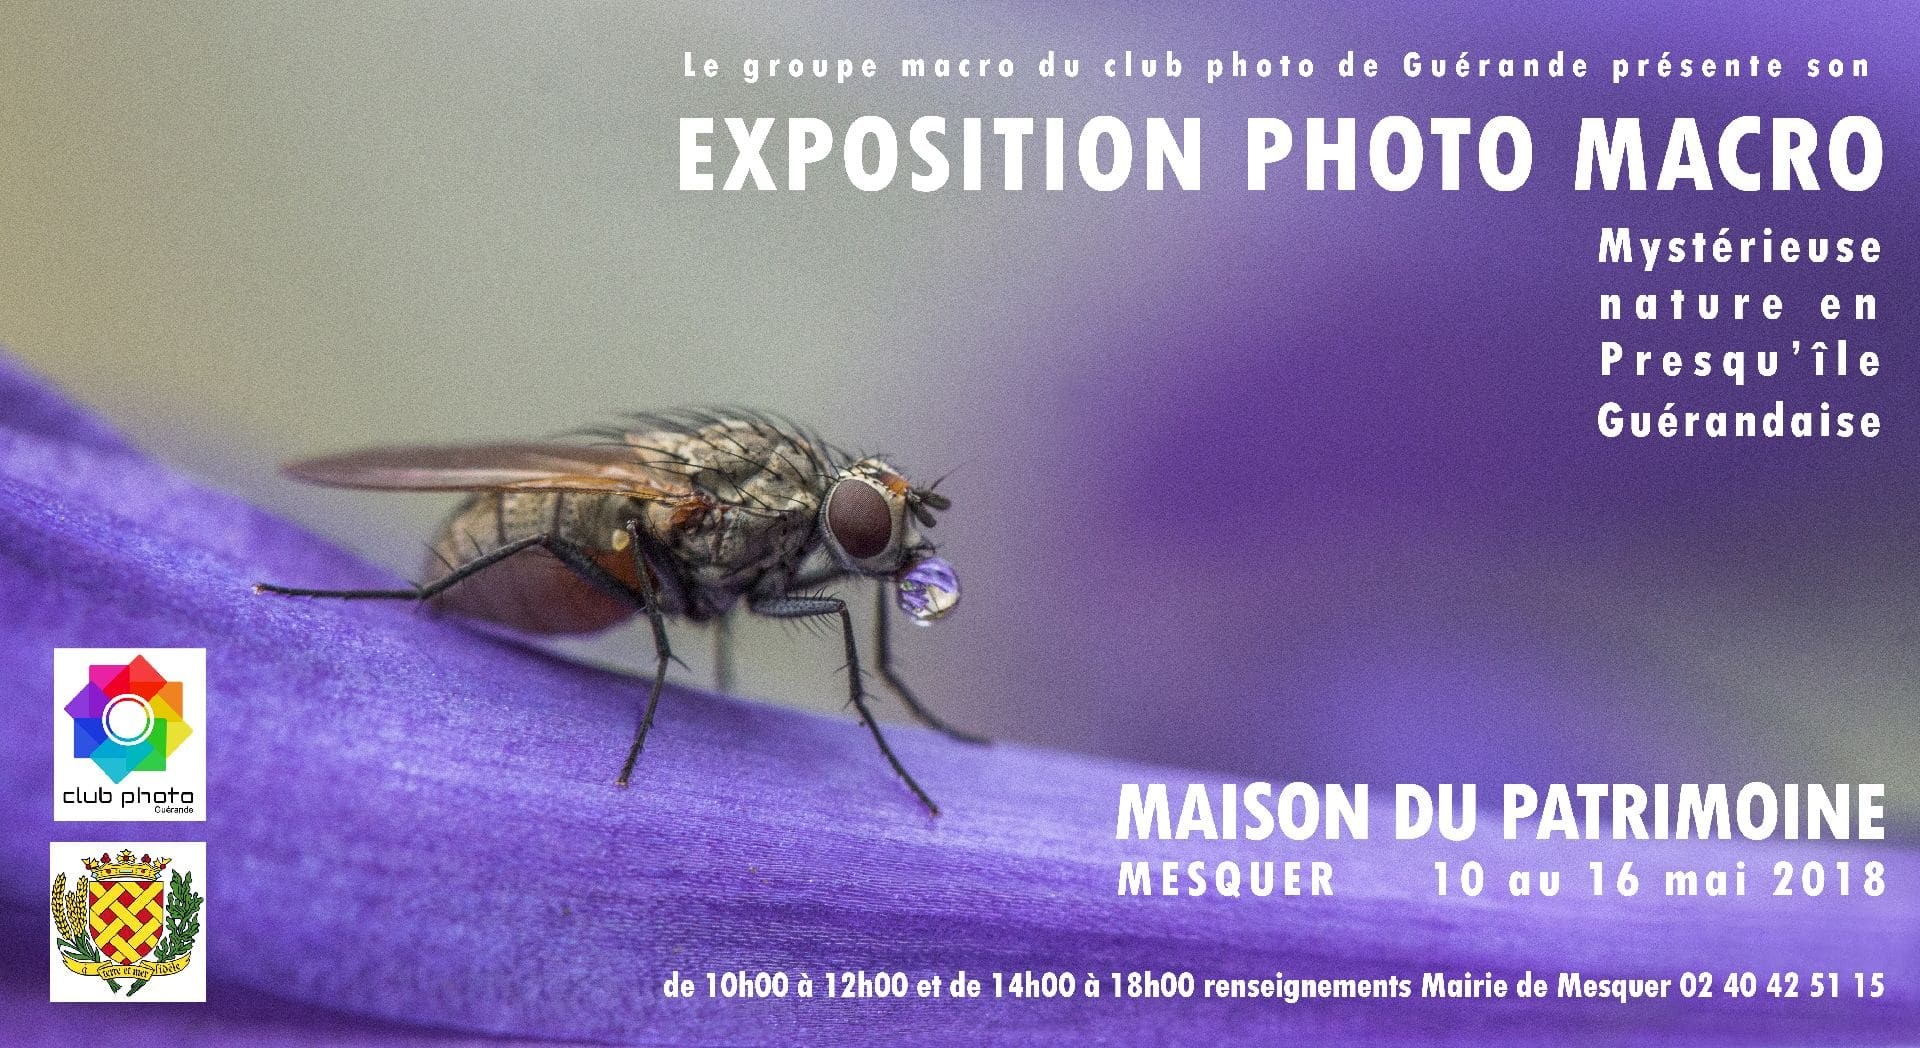 Mystérieuse Nature en Presqu'île de Guérande